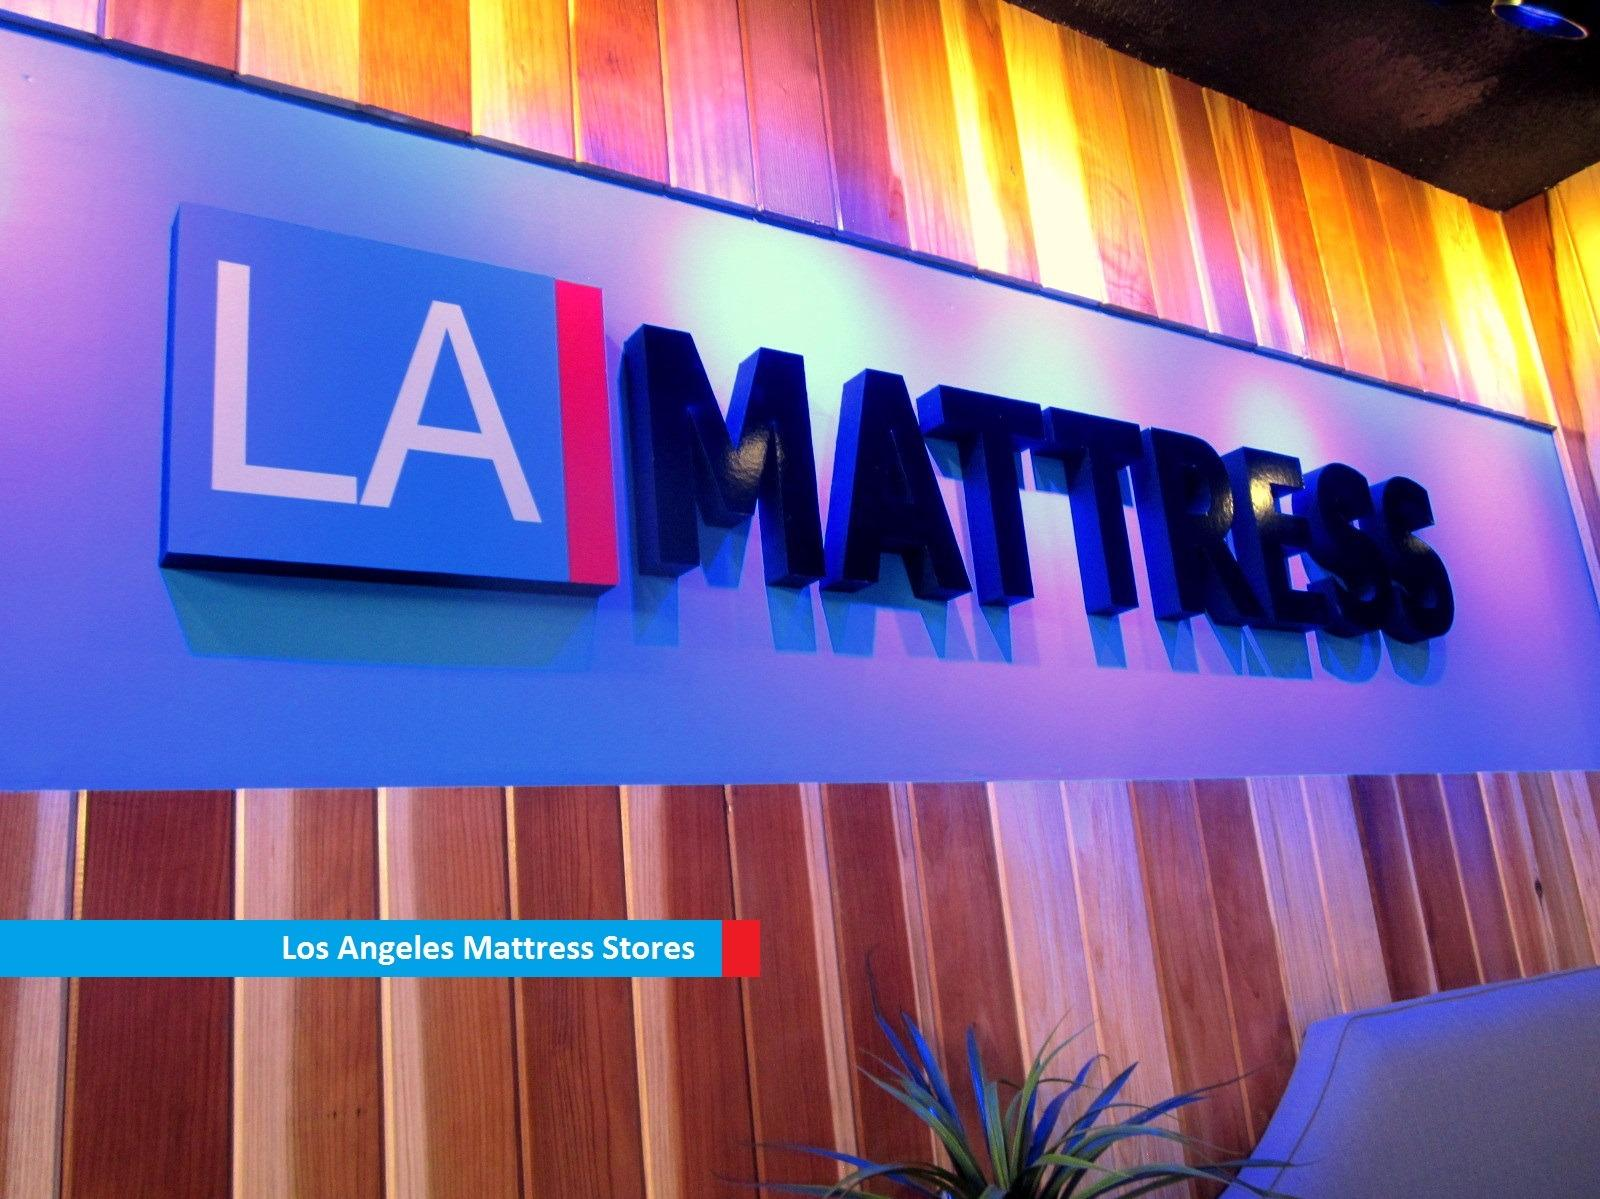 Los Angeles Mattress Stores image 0